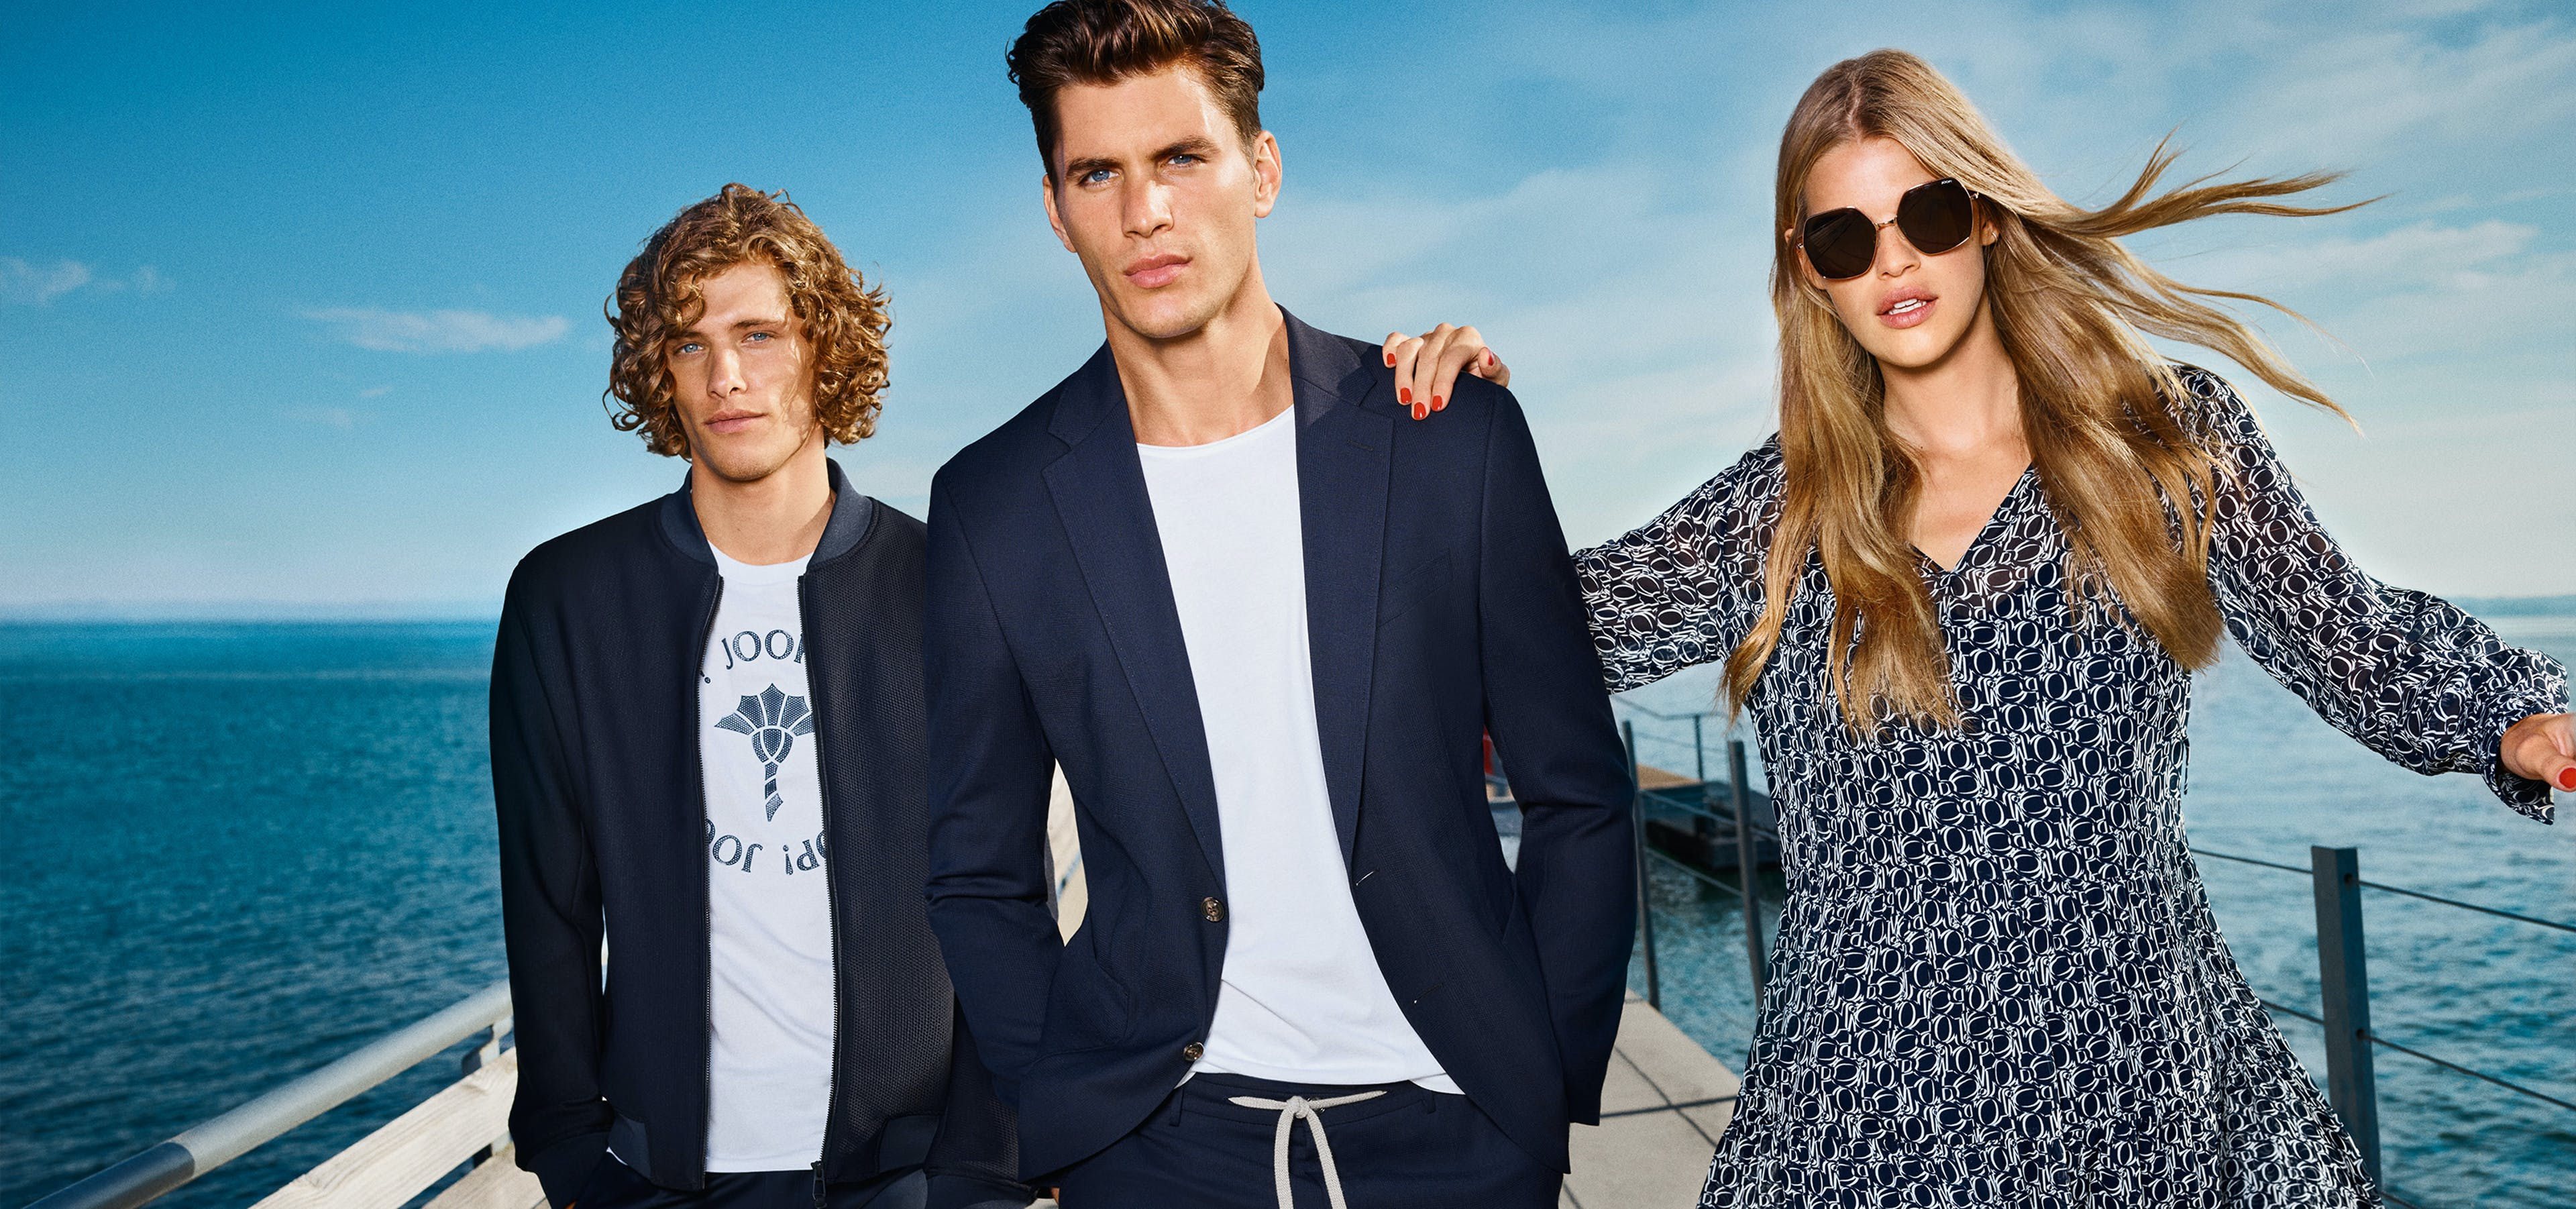 Drei Models in JOOP! Kleidung